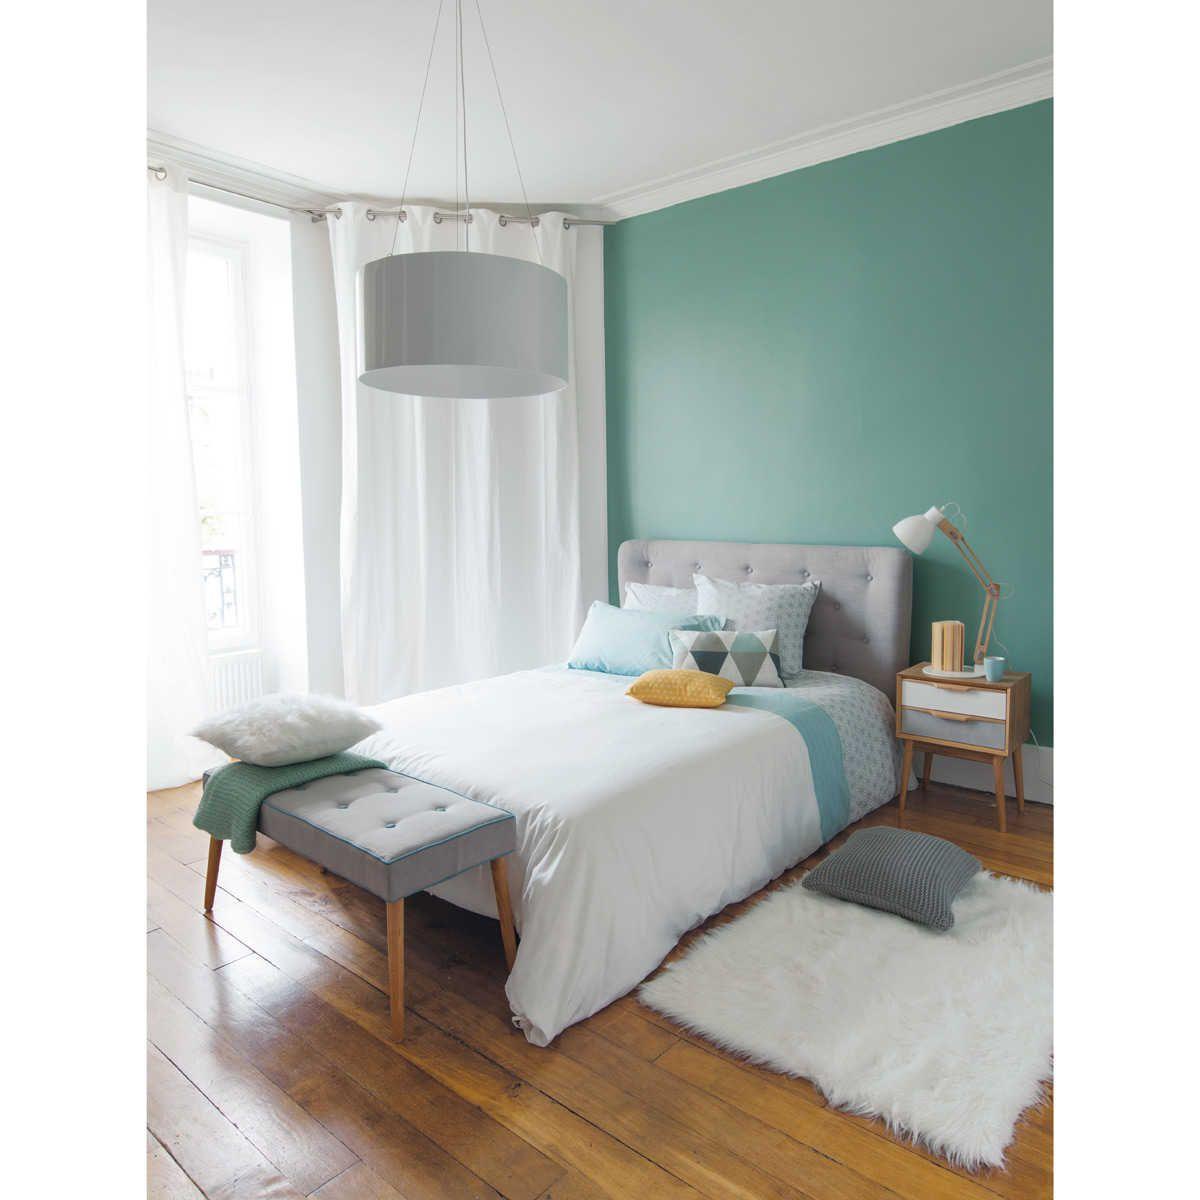 comment rafra chir sa pi ce un peu de repos maison chambre et deco chambre. Black Bedroom Furniture Sets. Home Design Ideas